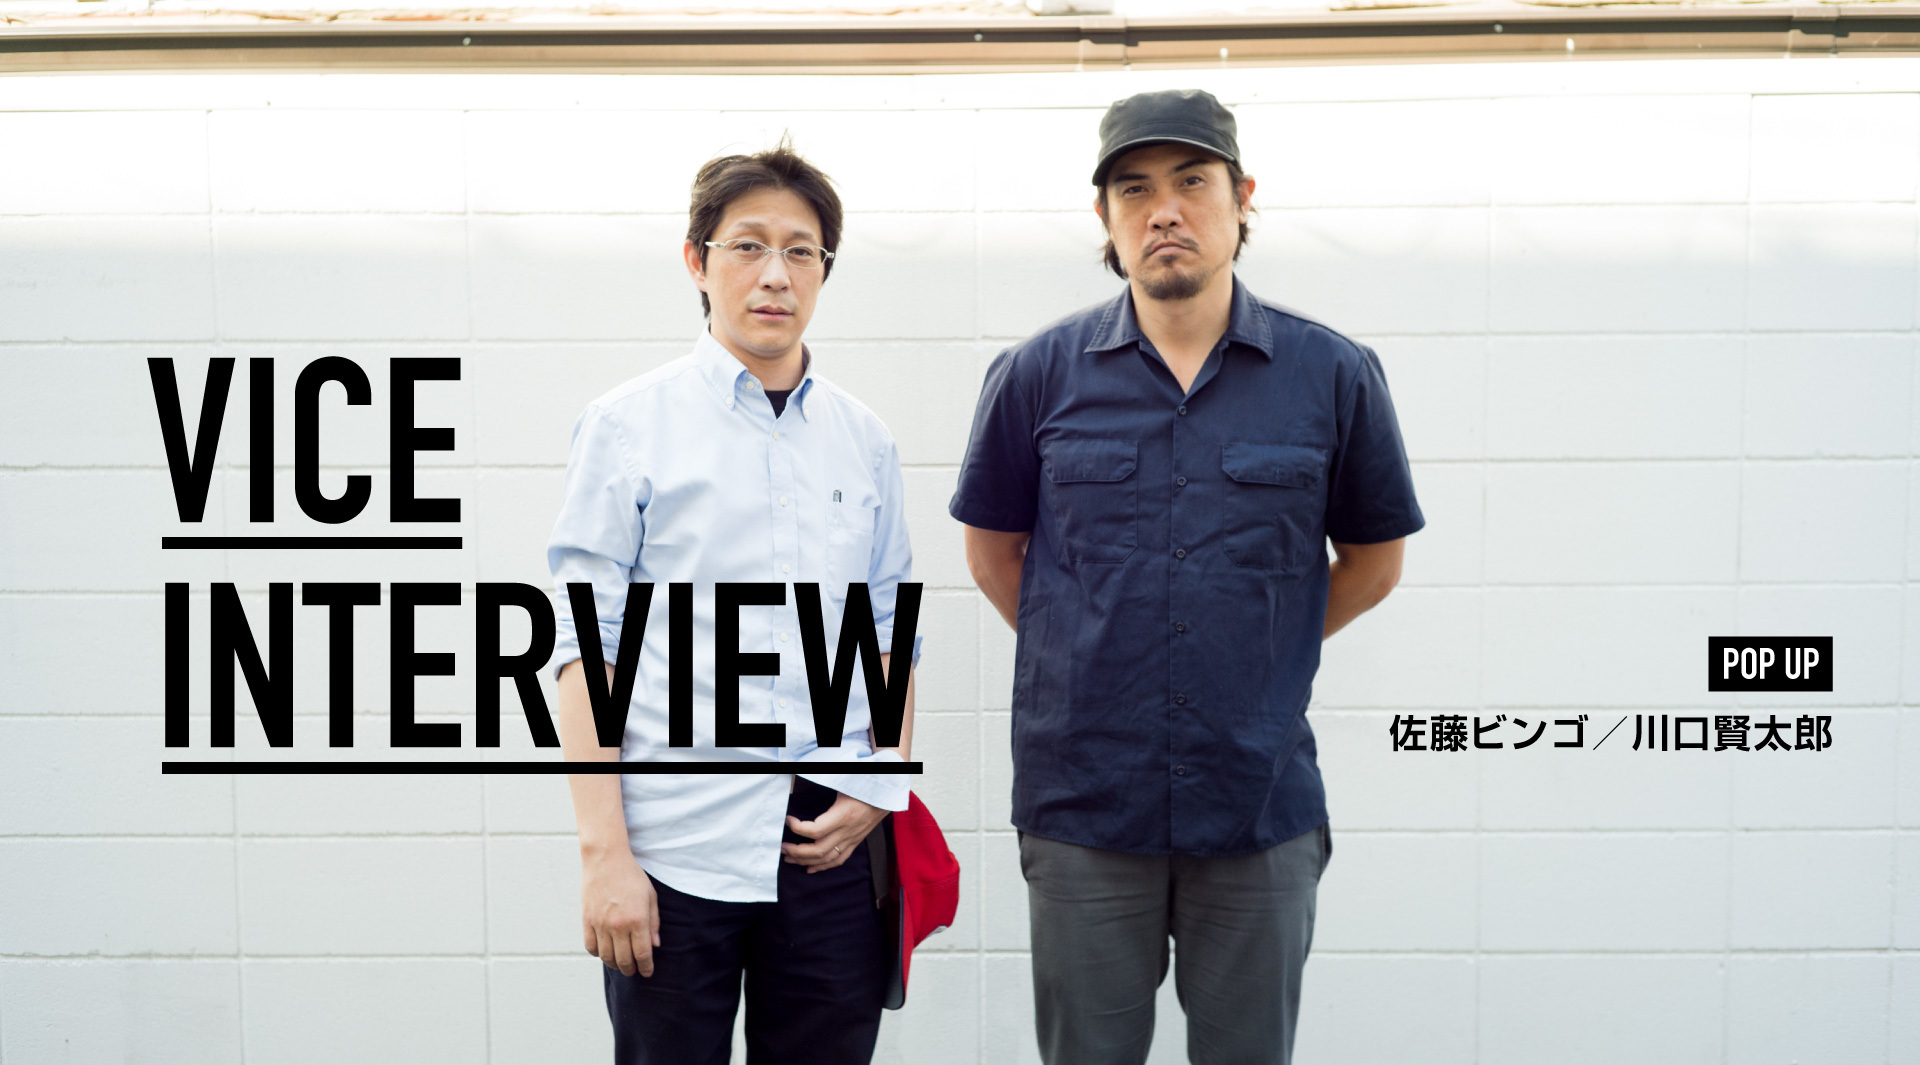 VICE Japan代表&編集長インタビュー バンドマンからメディアの運営になった2人の苦悩と展望